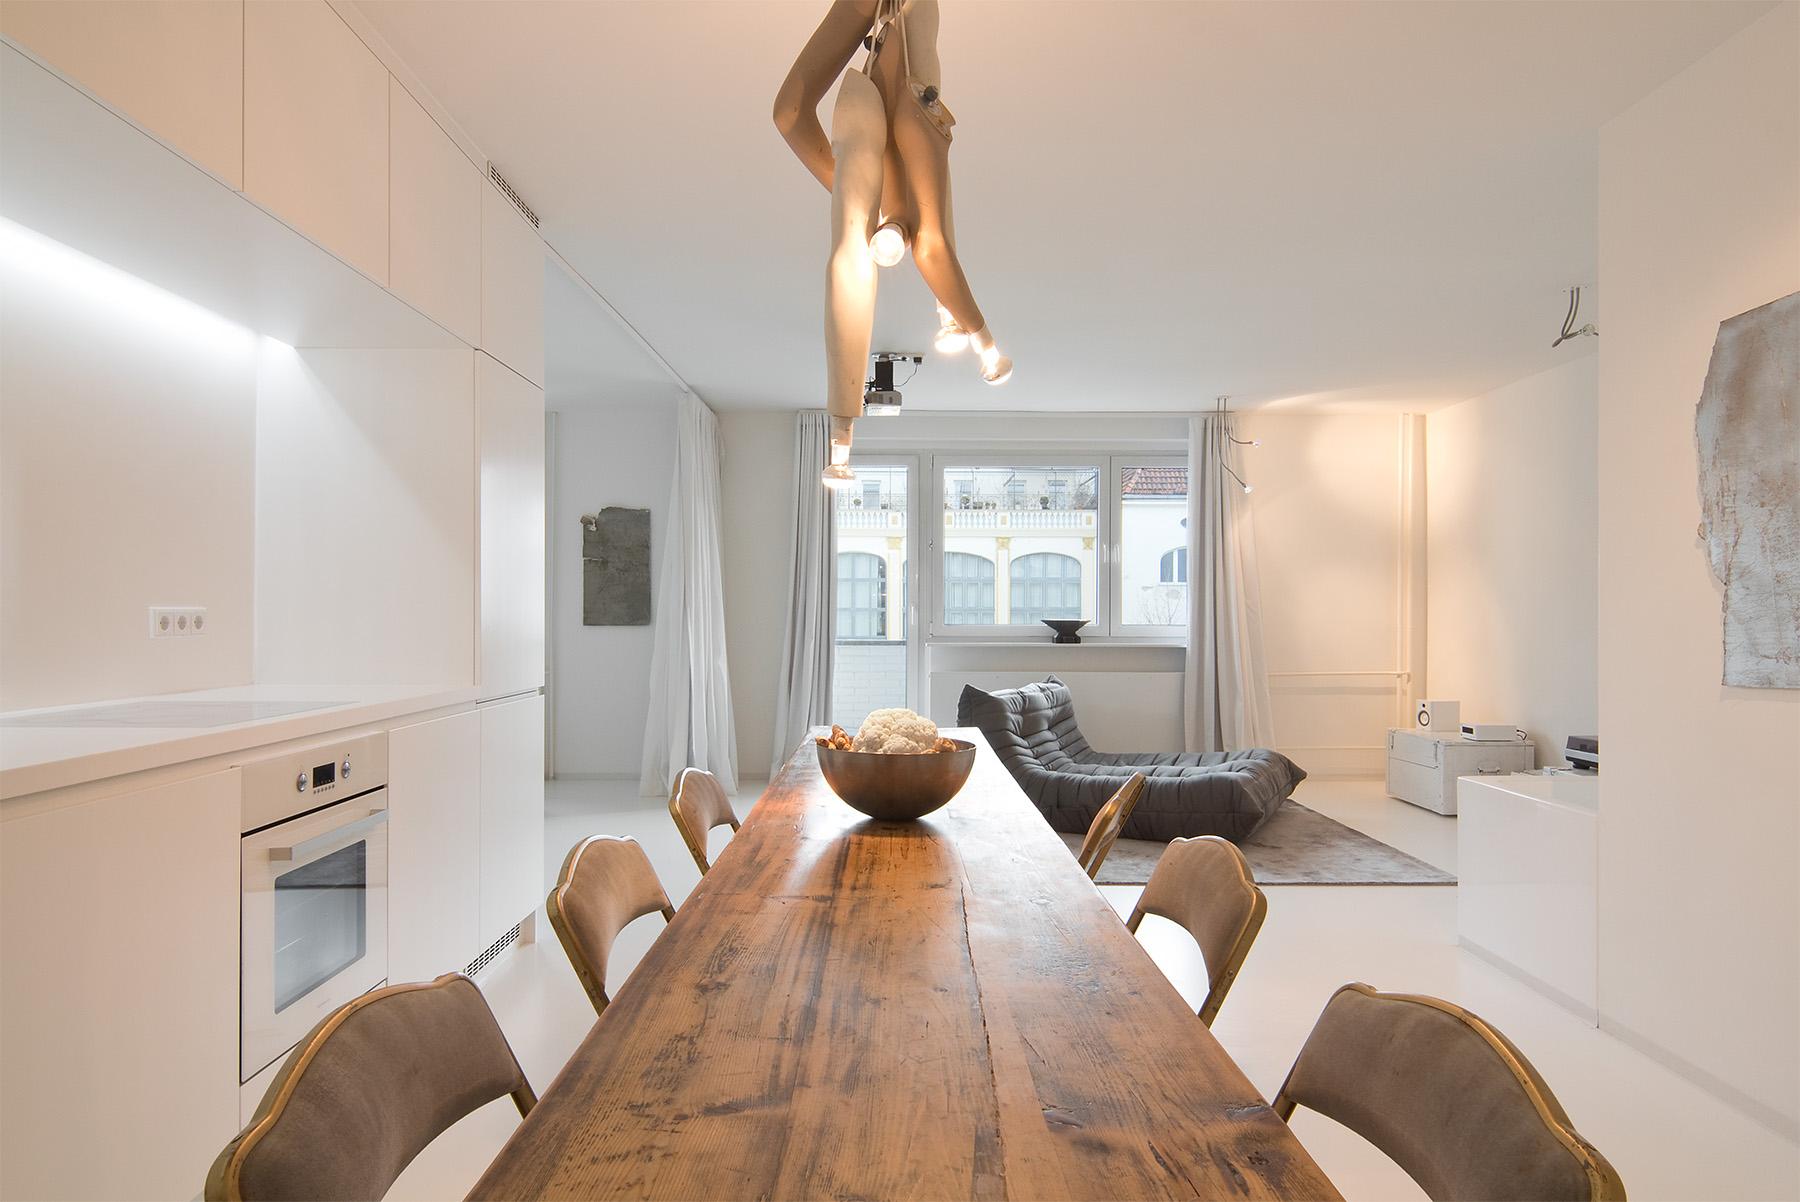 kd76 microloft no 1. Black Bedroom Furniture Sets. Home Design Ideas